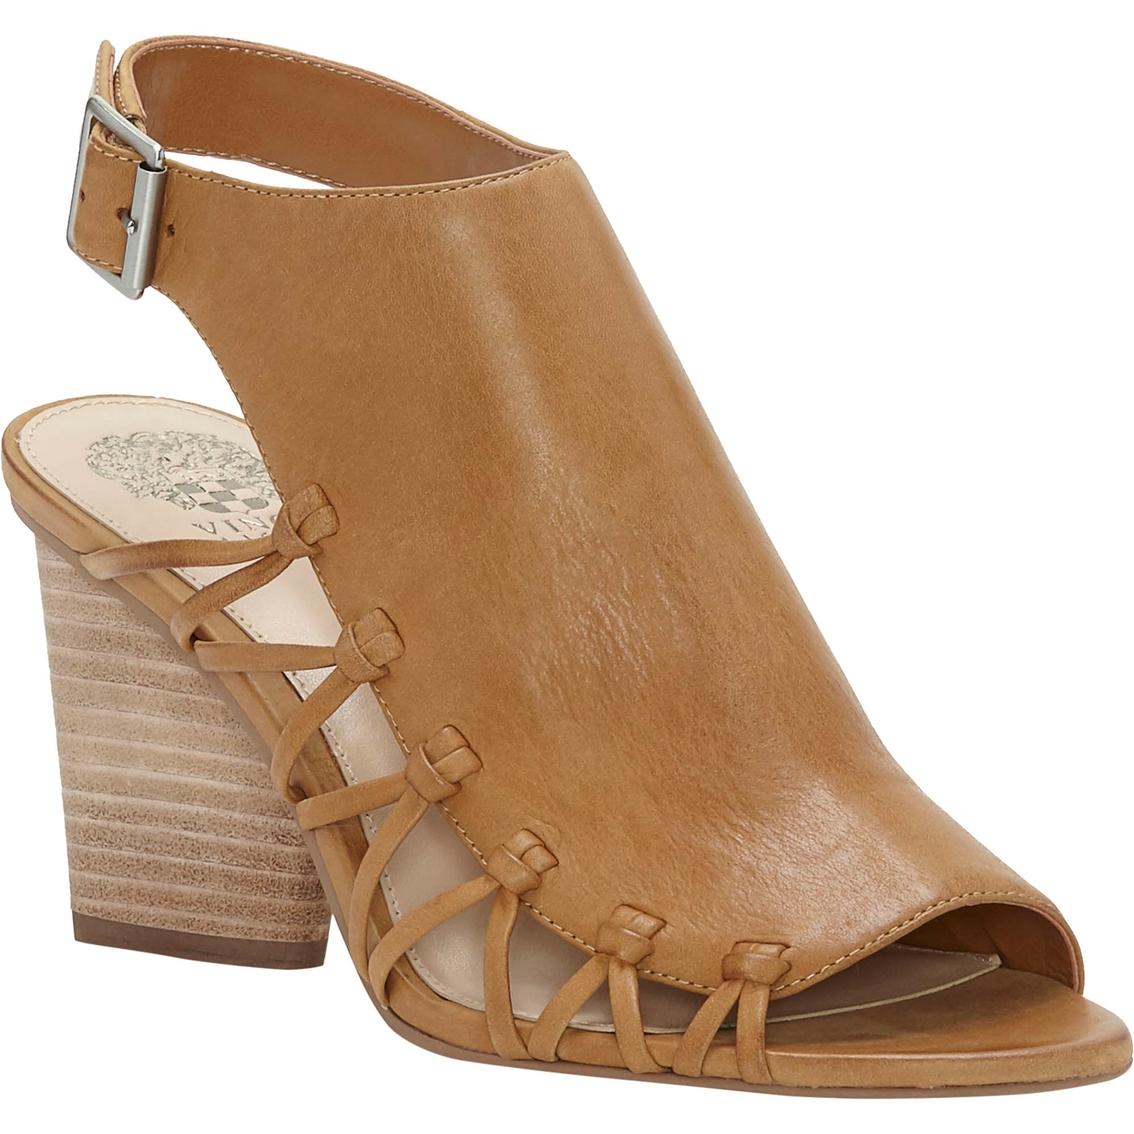 a39affb476fc Vince Camuto Ankara Peep Toe Sandals